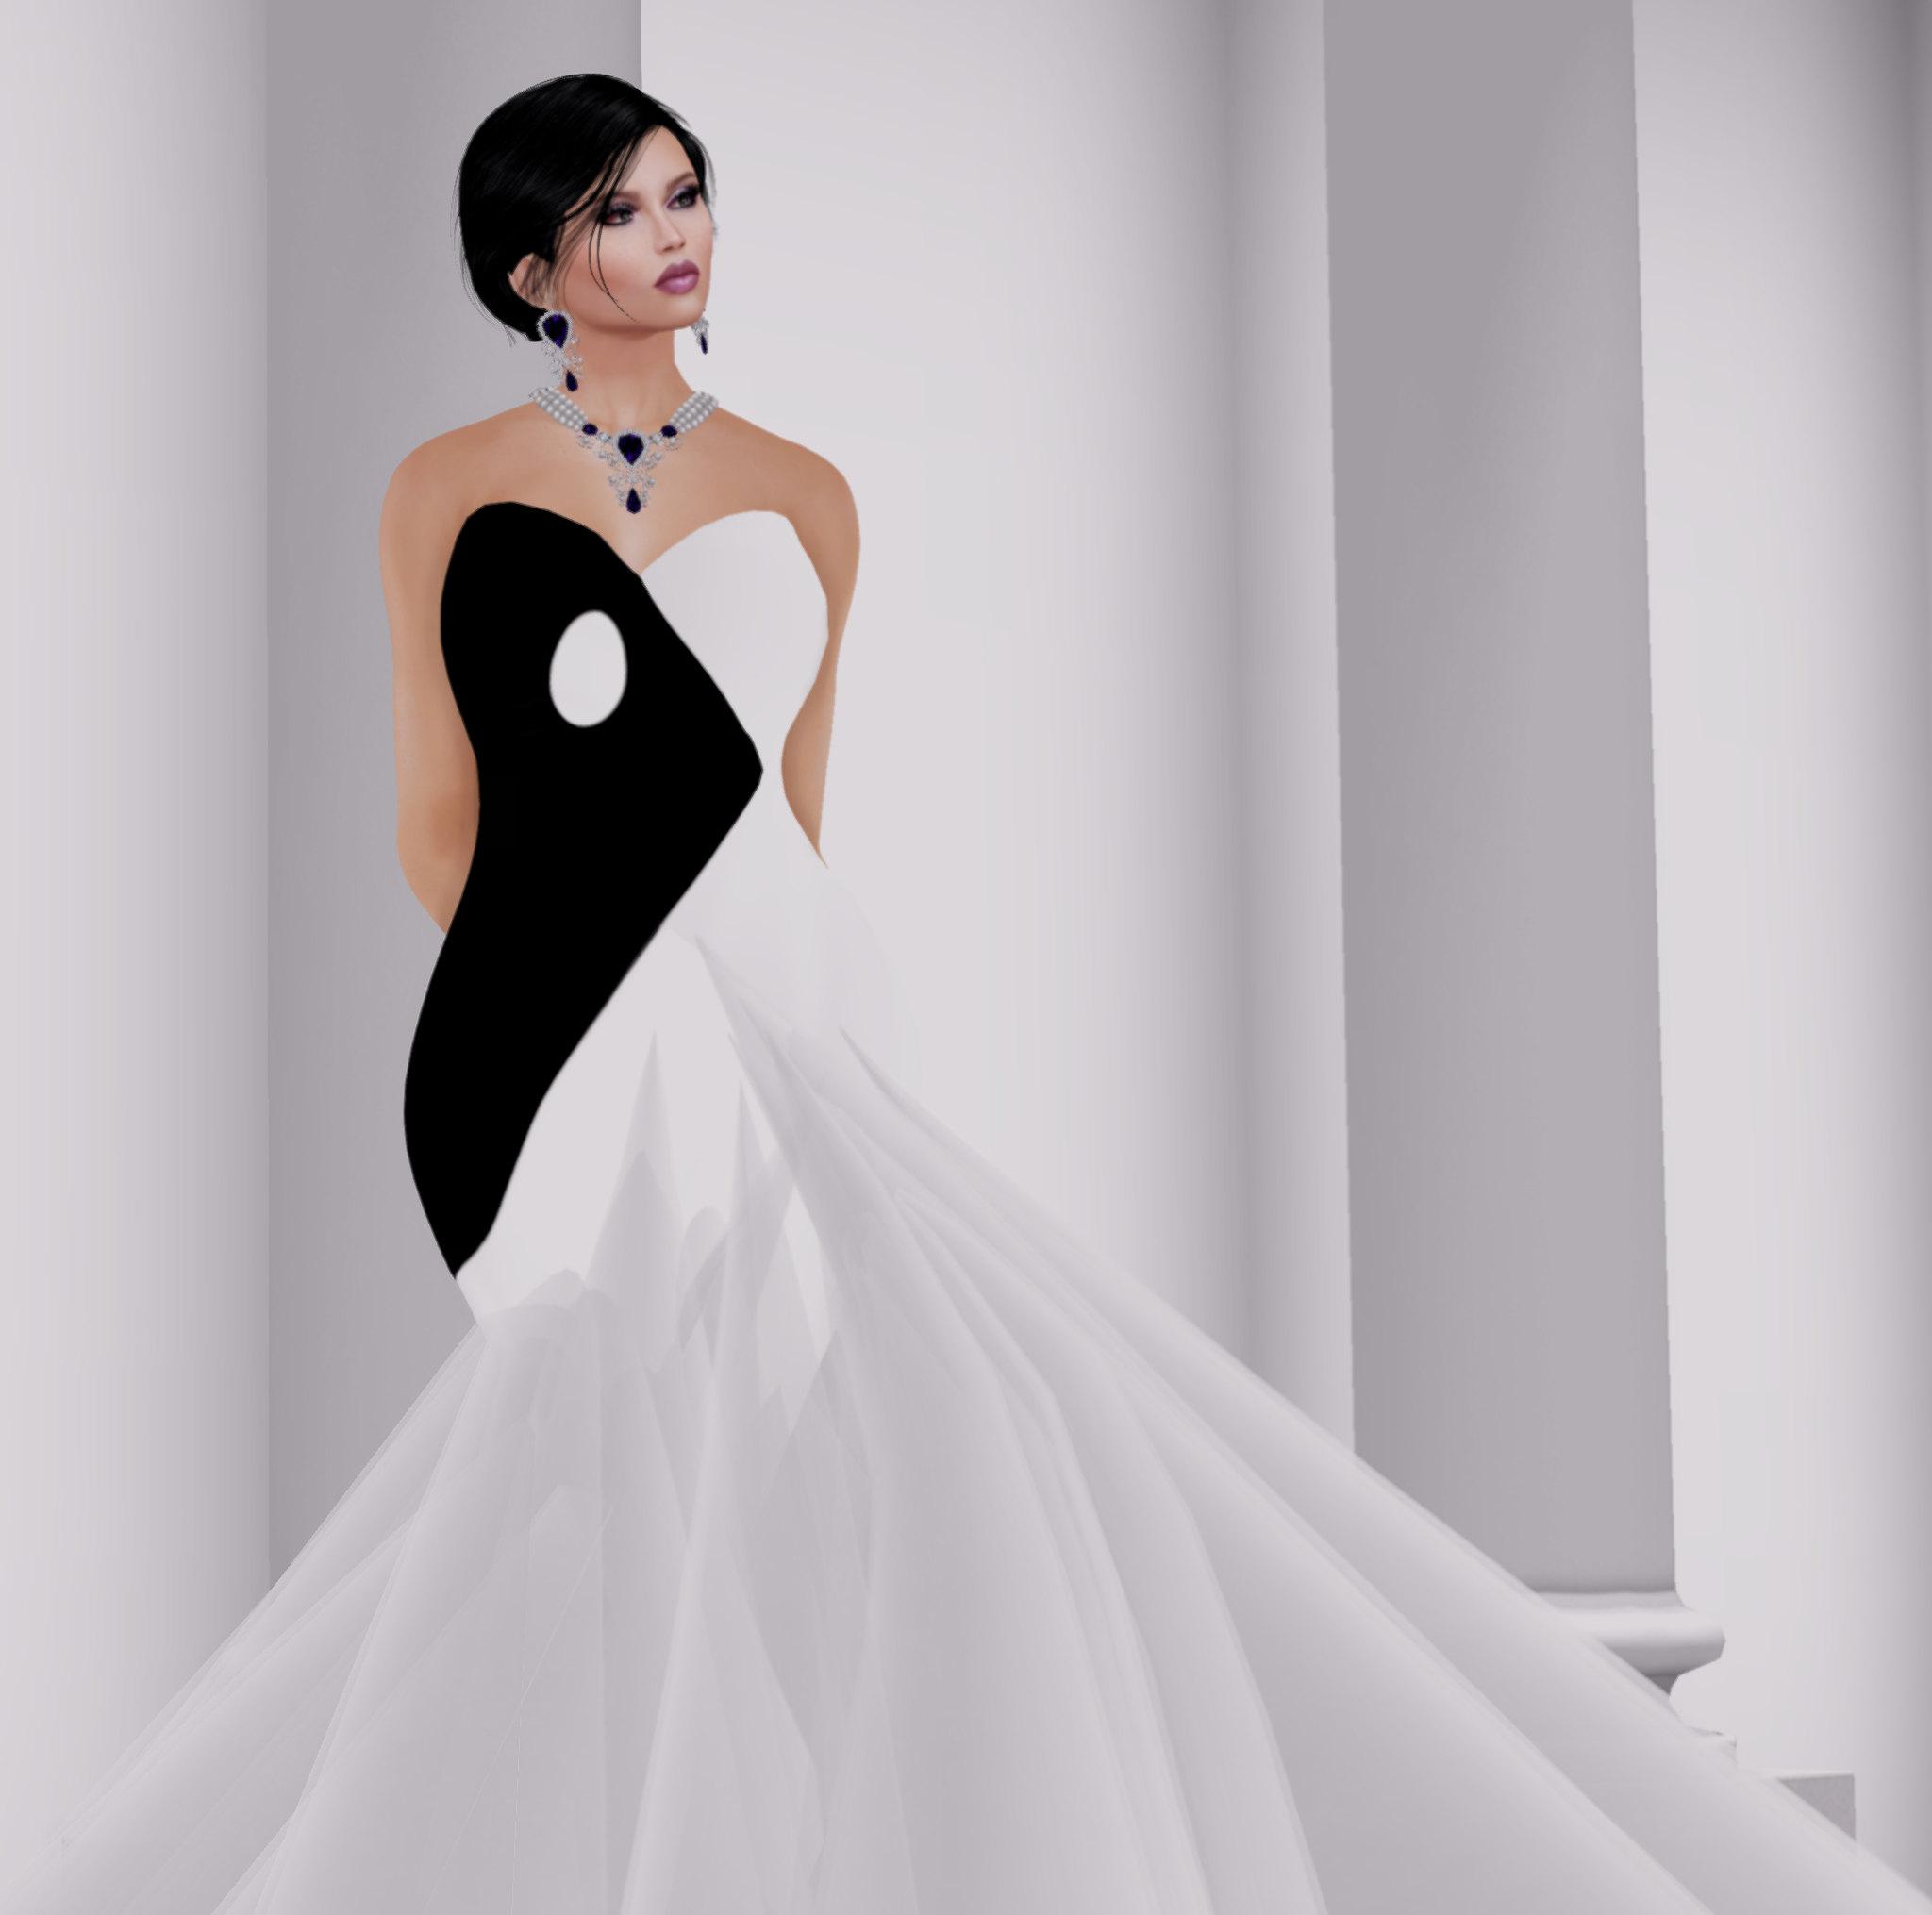 YinYang gown Sascha's Designs